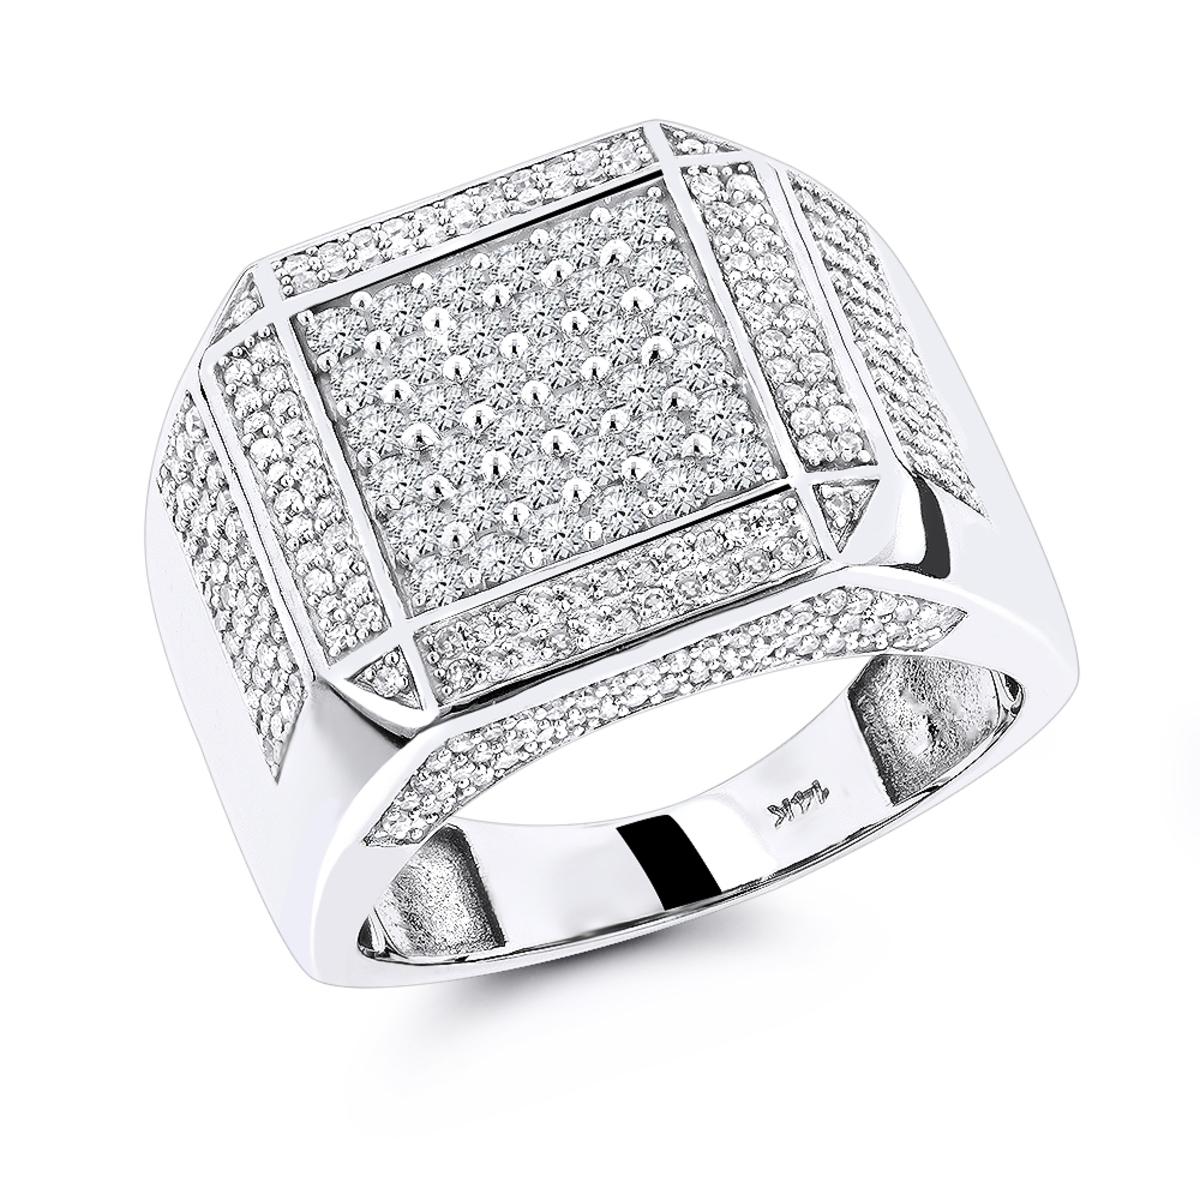 14K Gold Mens Diamond Ring 1.83ct